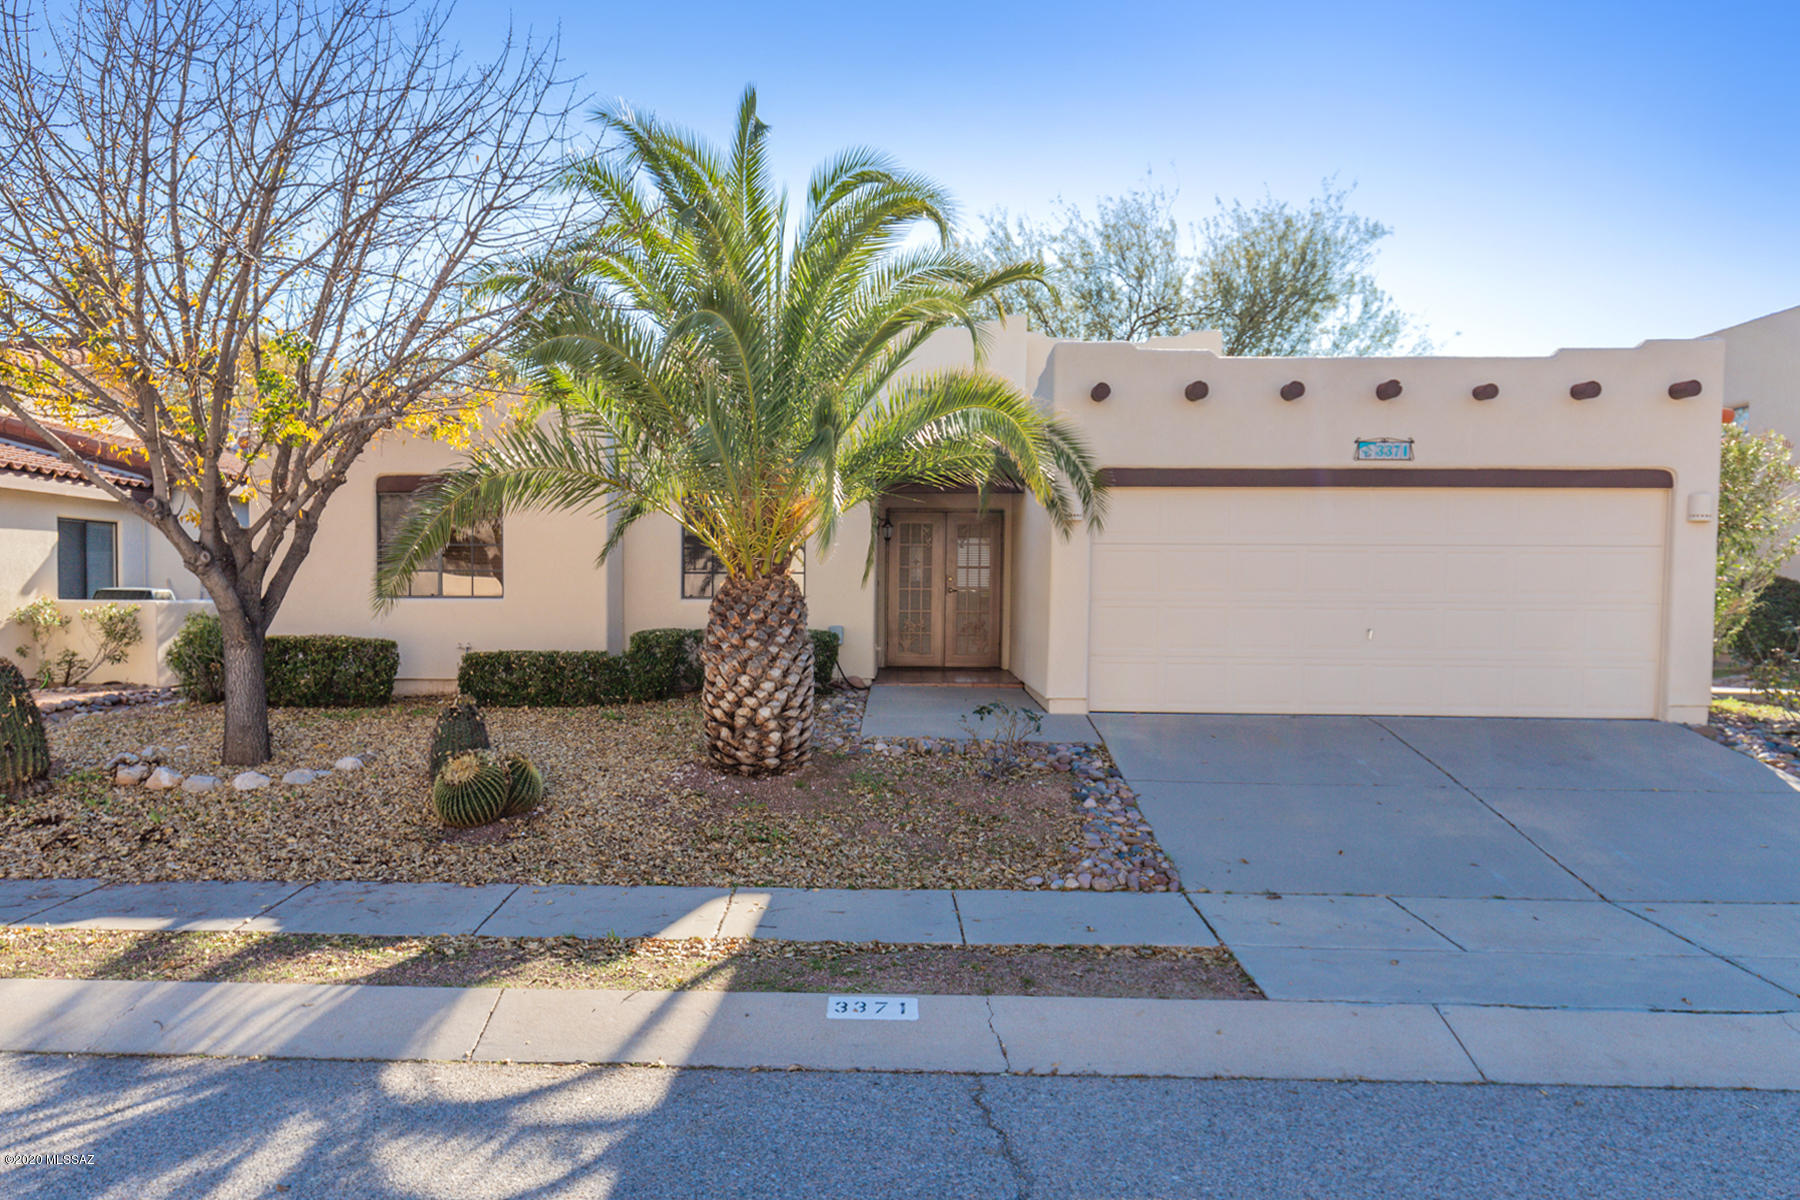 3371 W Vision Dr Tucson Az 85742 Mls 22002586 Coldwell Banker